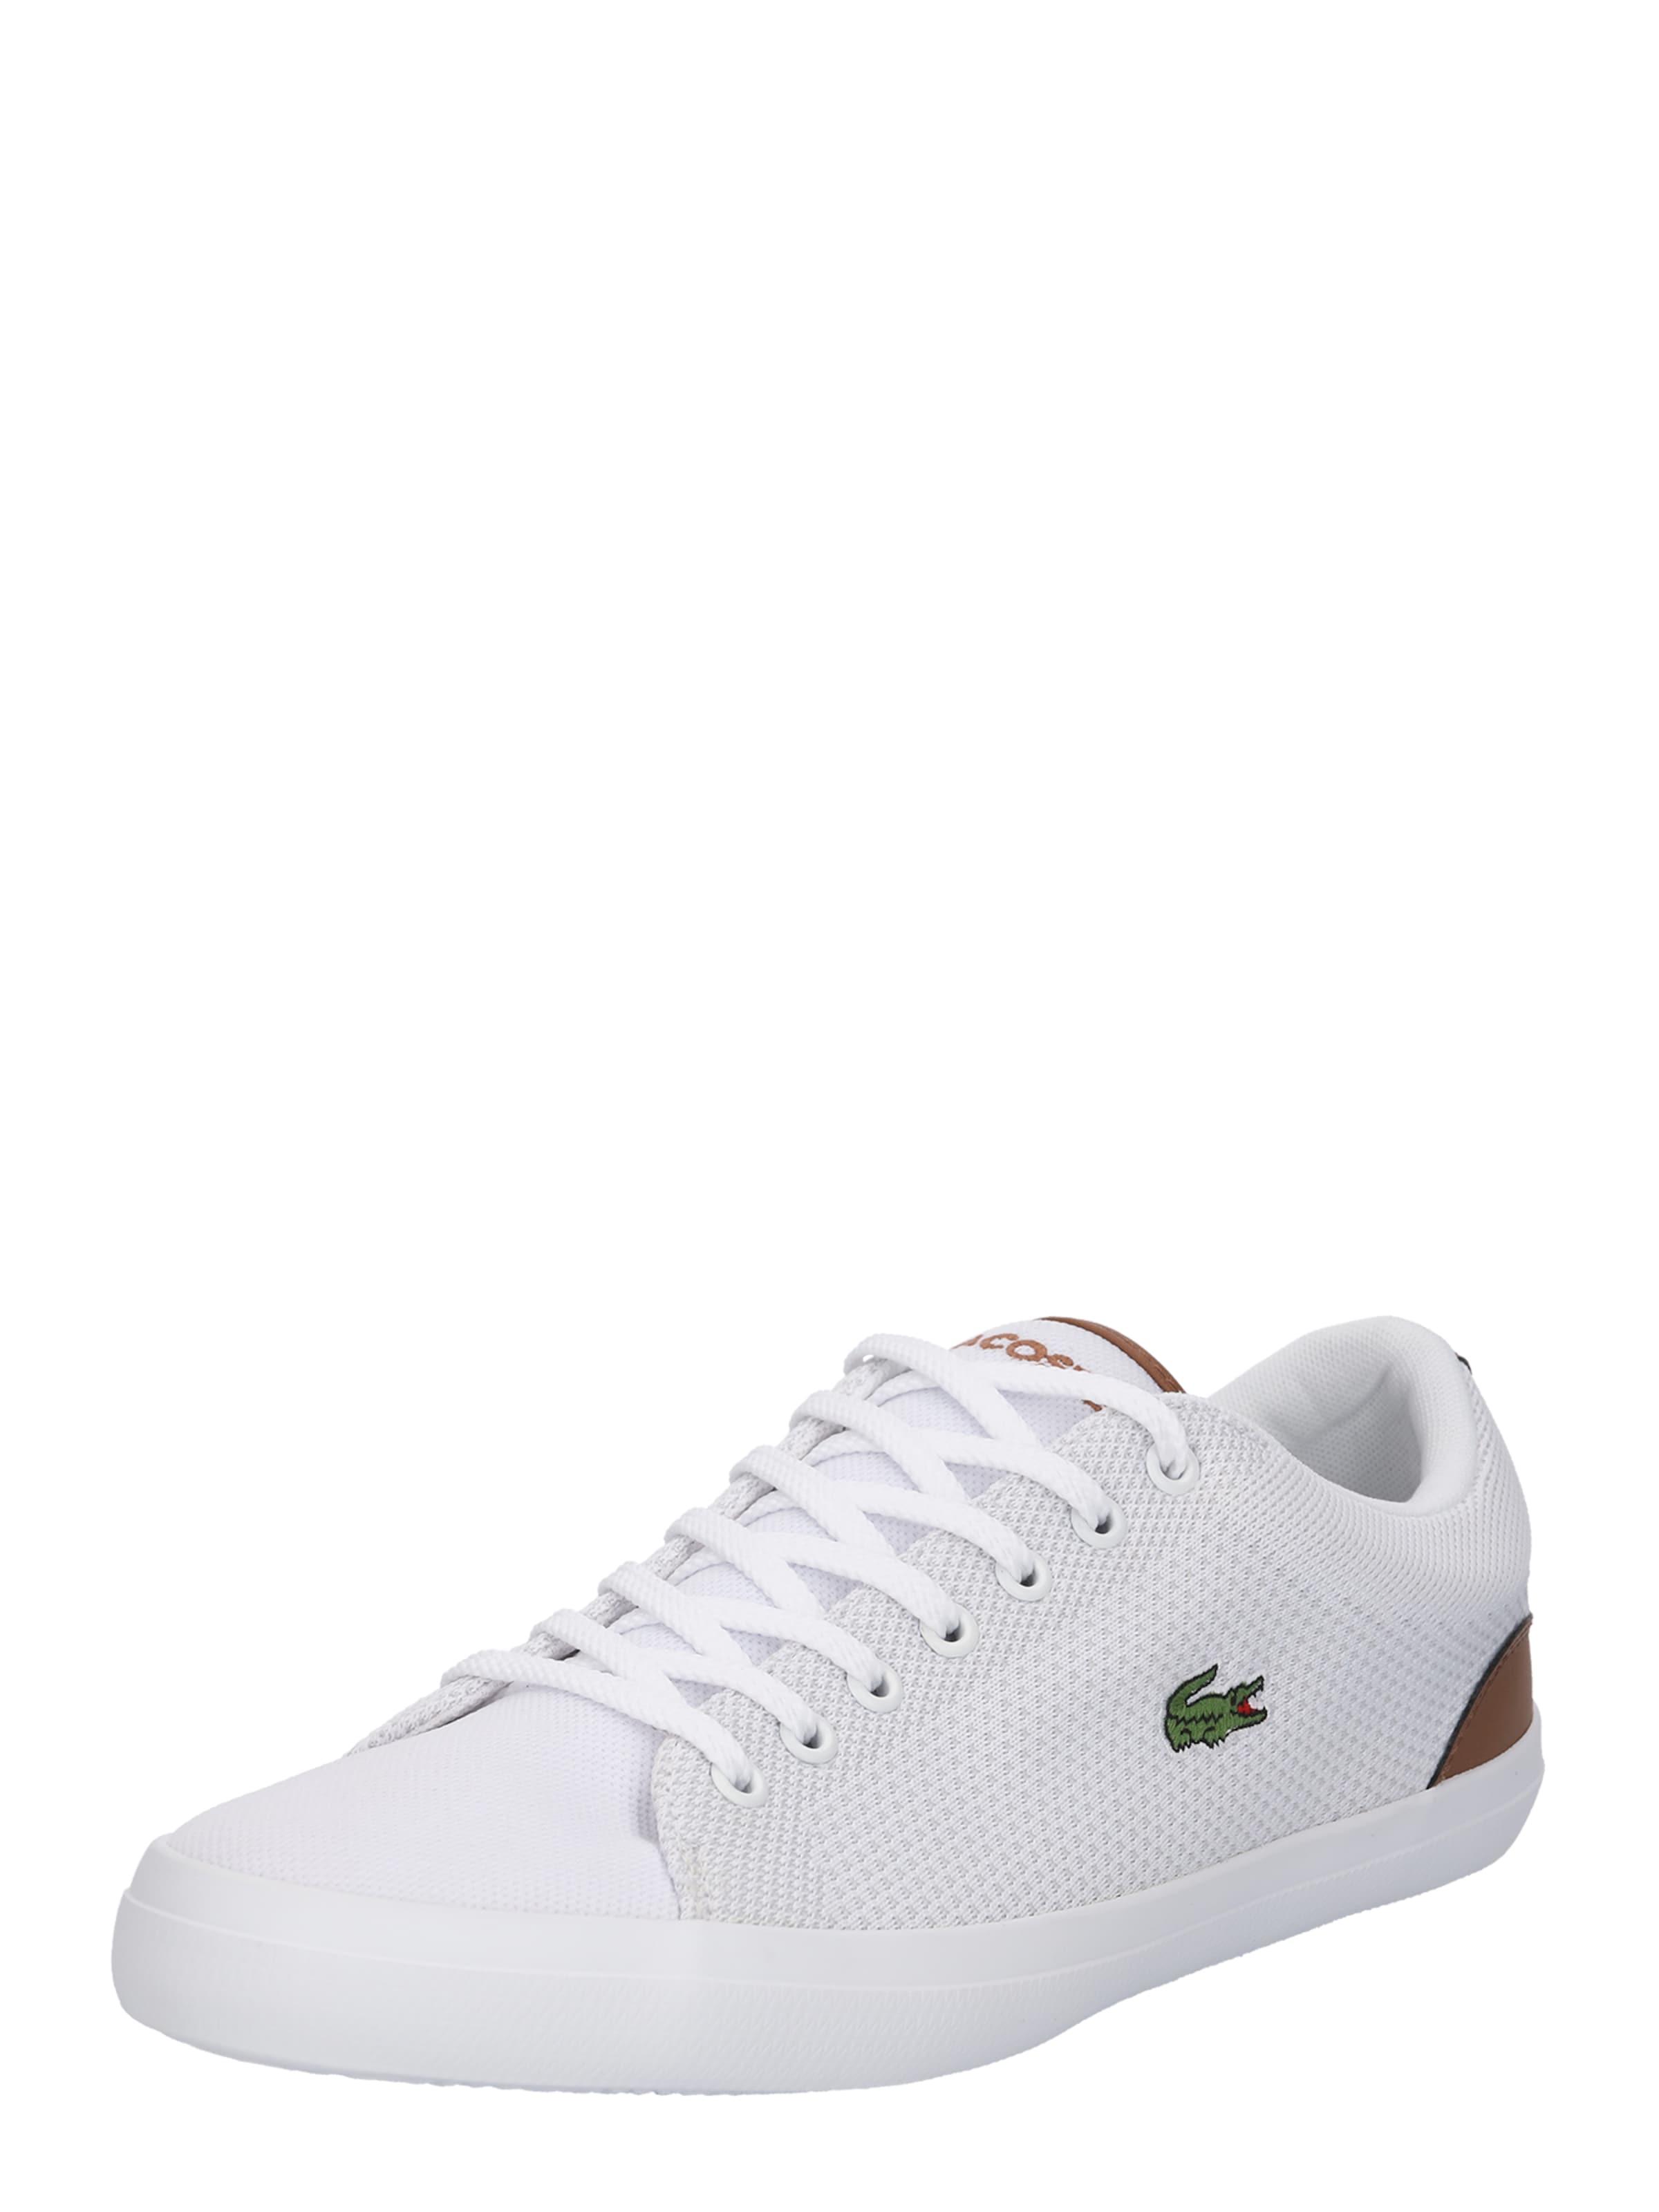 Haltbare Mode billige Schuhe LACOSTE | Sneaker Low 'LEROND' 'LEROND' 'LEROND' Schuhe Gut getragene Schuhe d09bc7